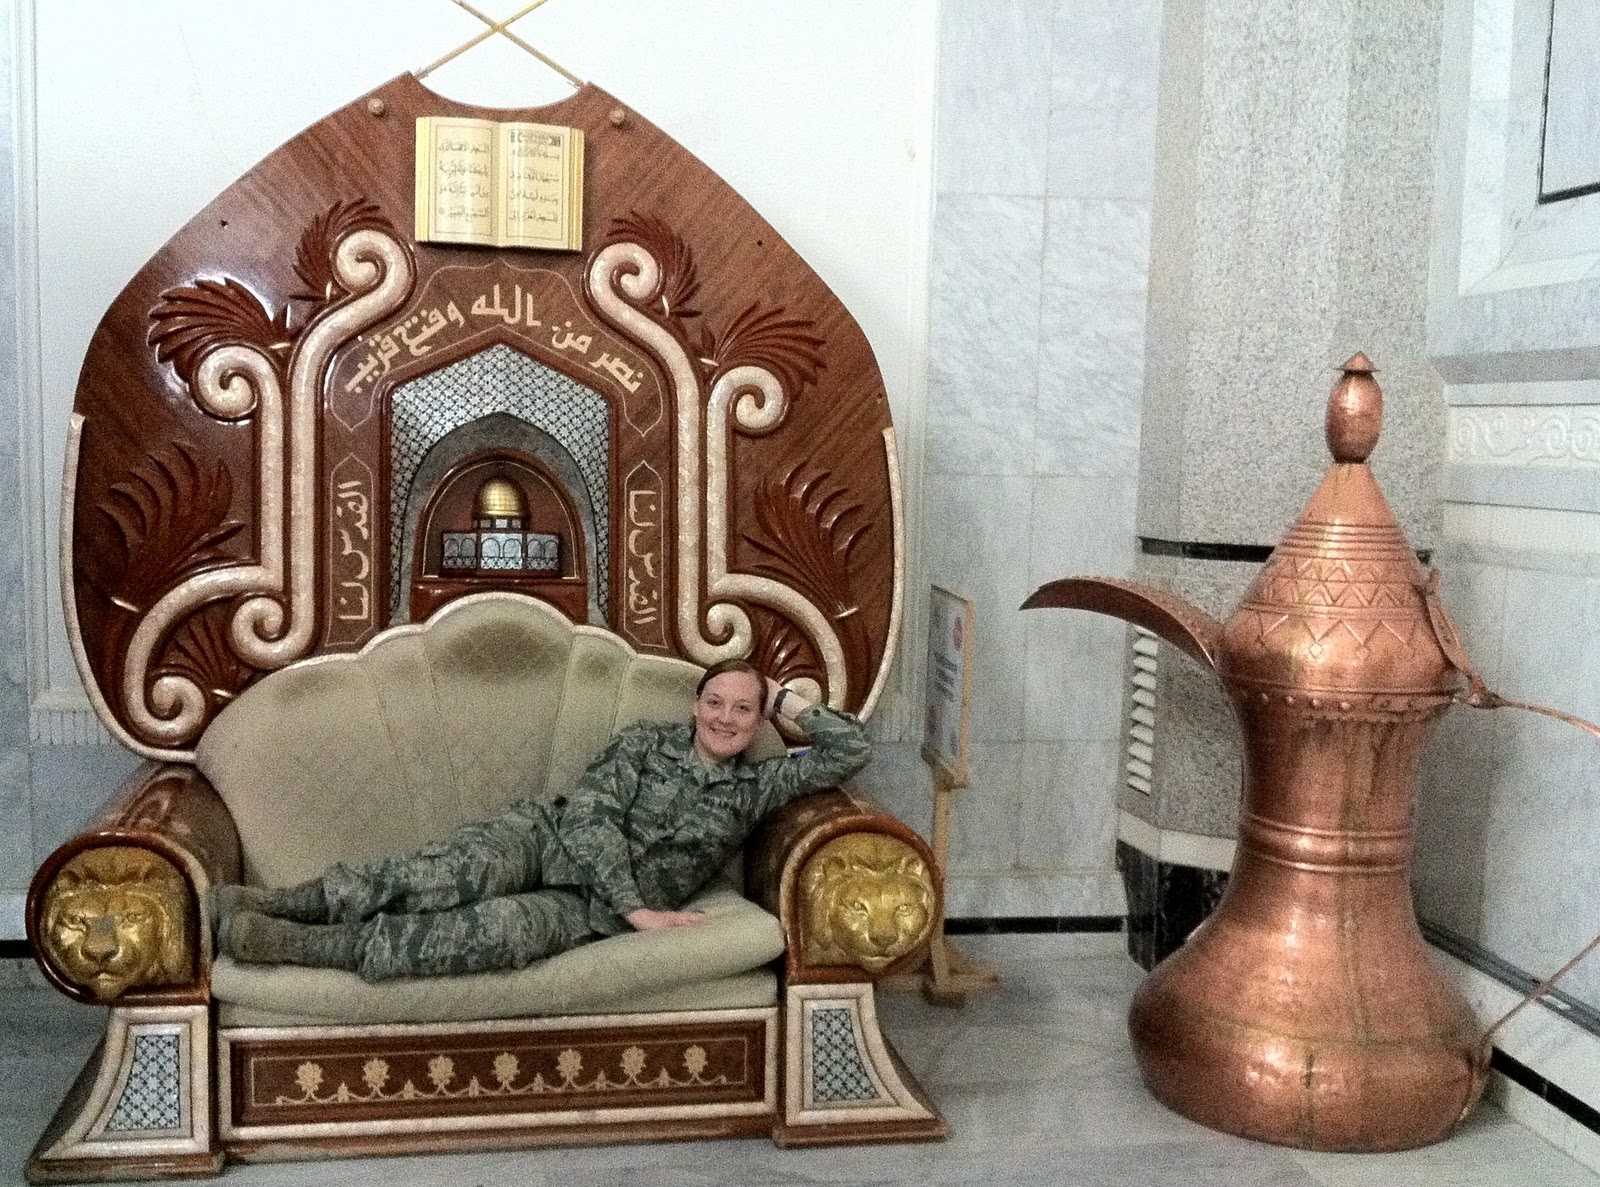 palace victory jbb baghdad base sadam yep fwa hanging chair al